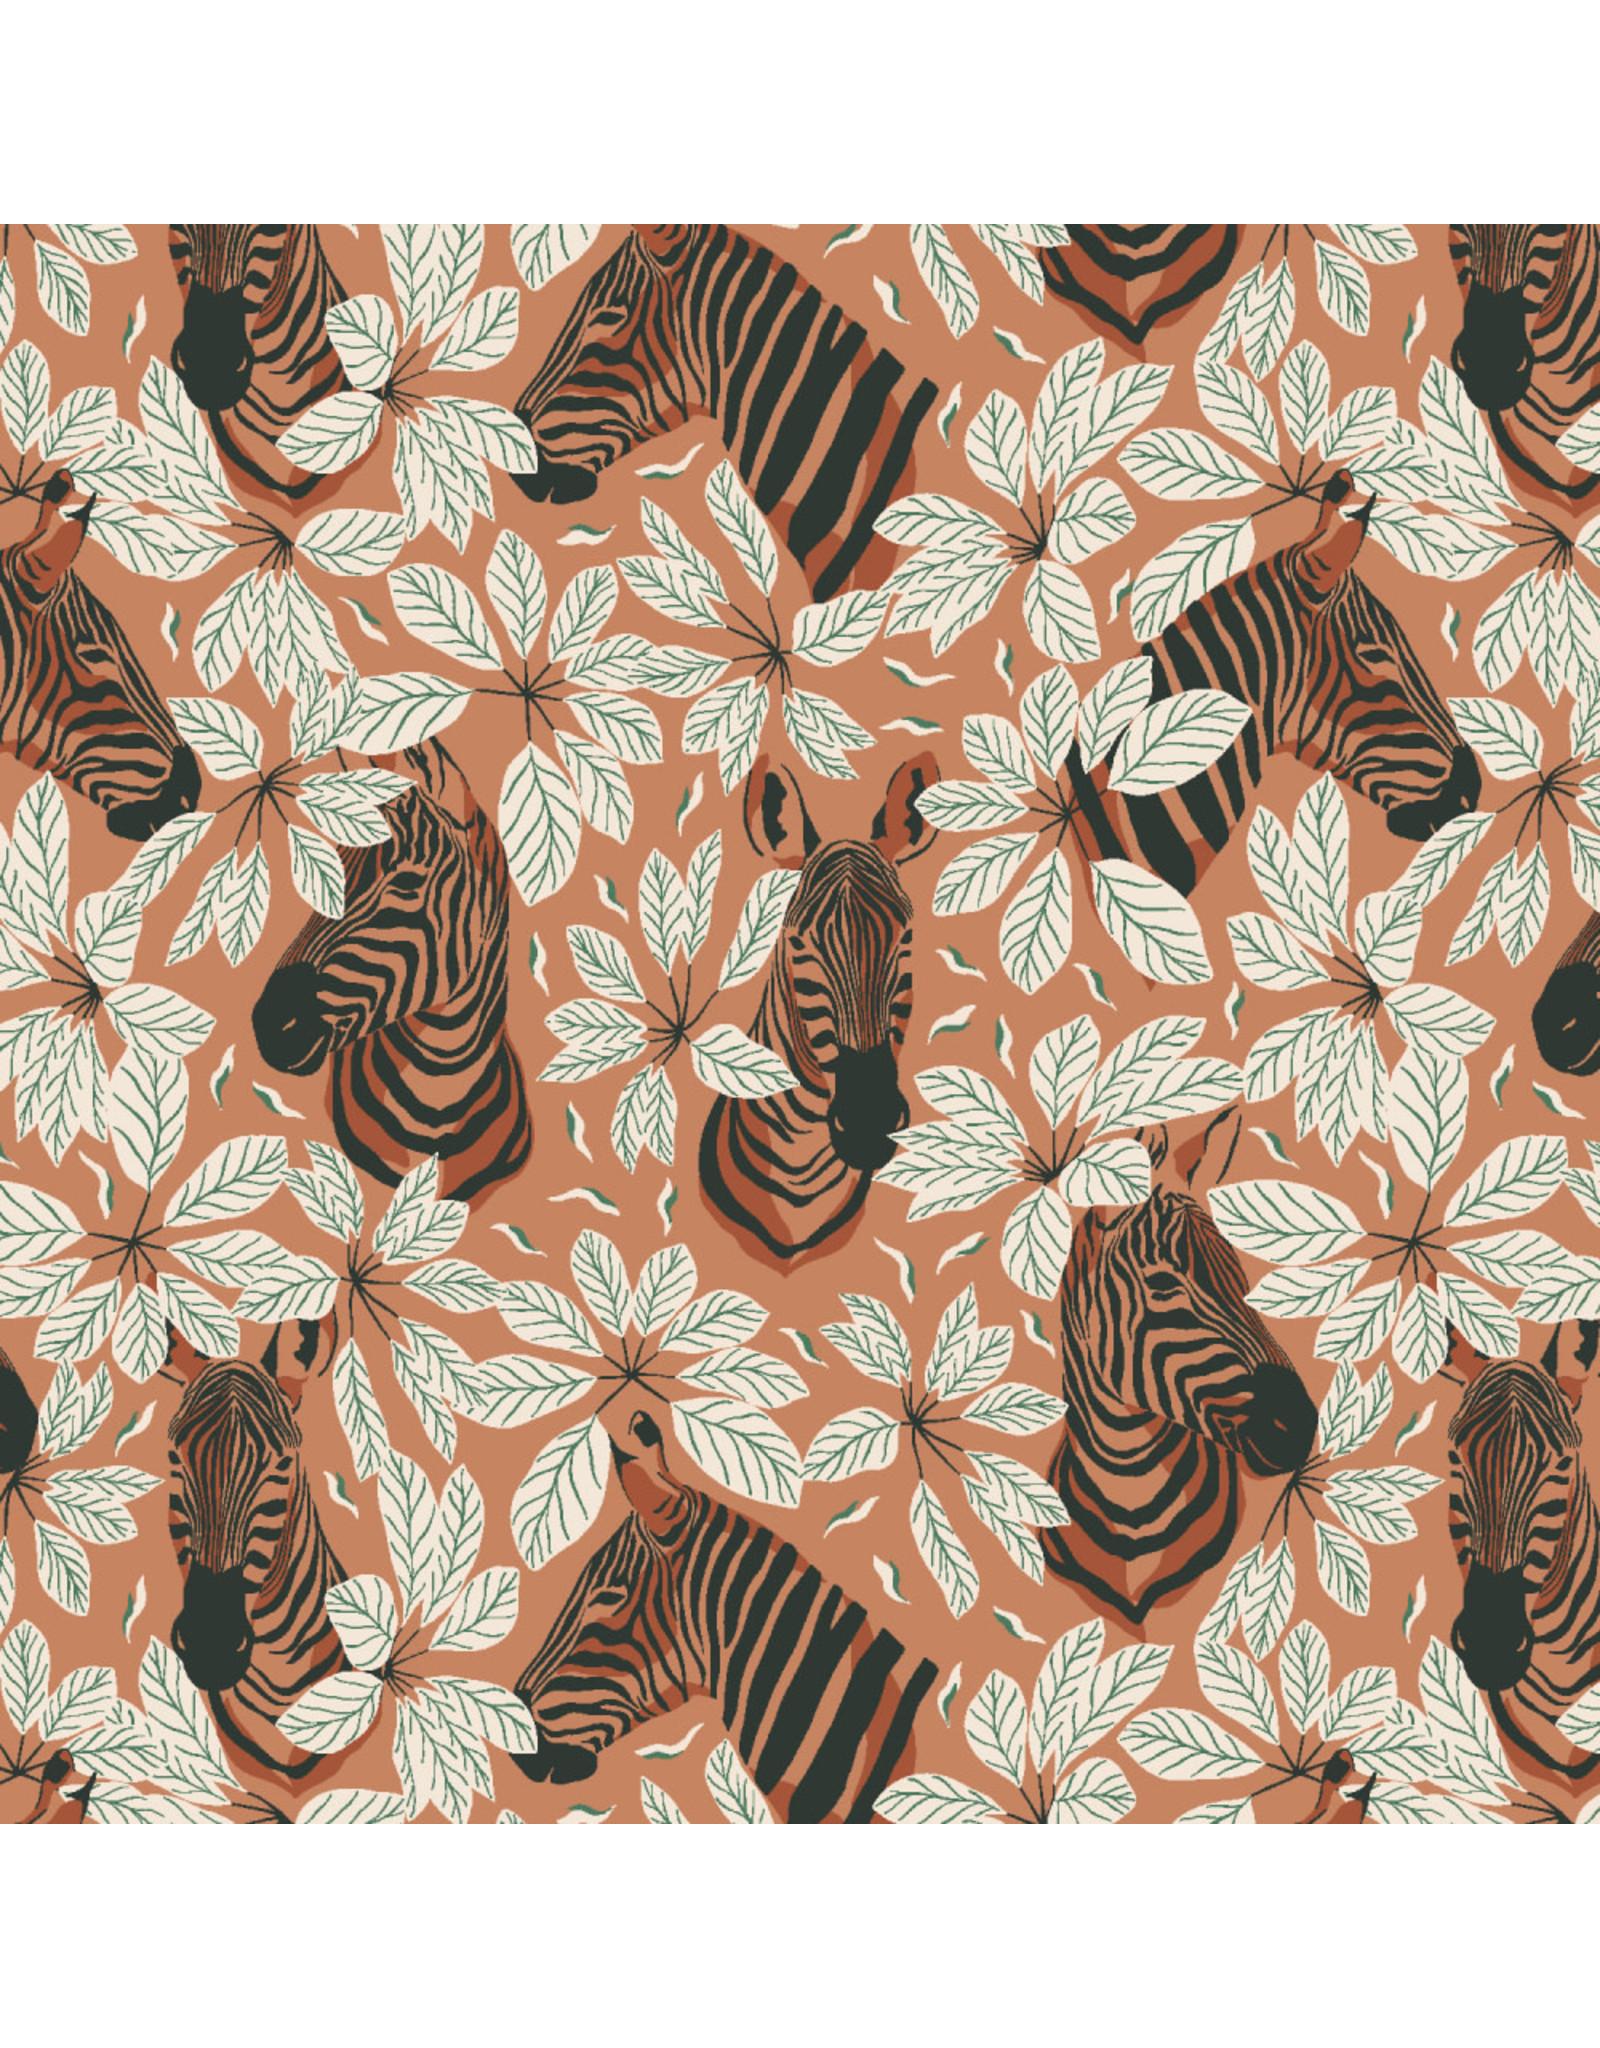 RJR Fabrics Magic of Serengeti, Happy Zebra in Amber Winds, Fabric Half-Yards